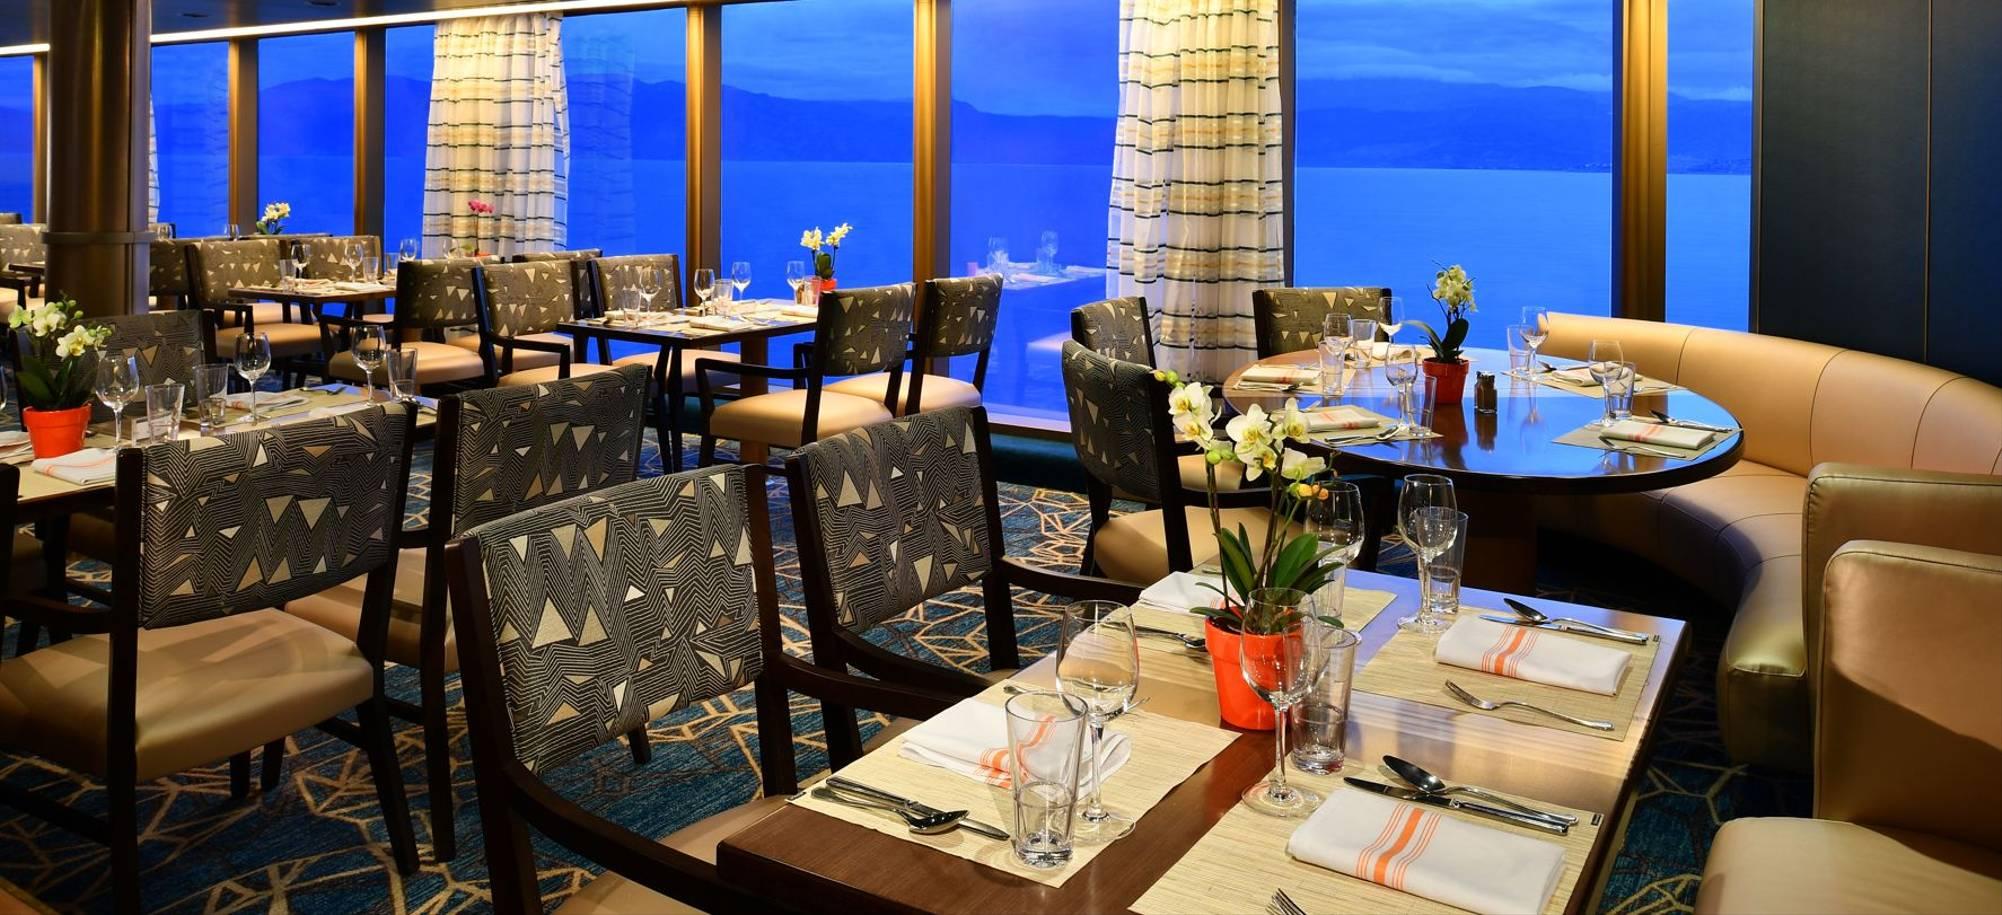 Day27 At Sea - Restaurant - Itinerary Desktop .jpg